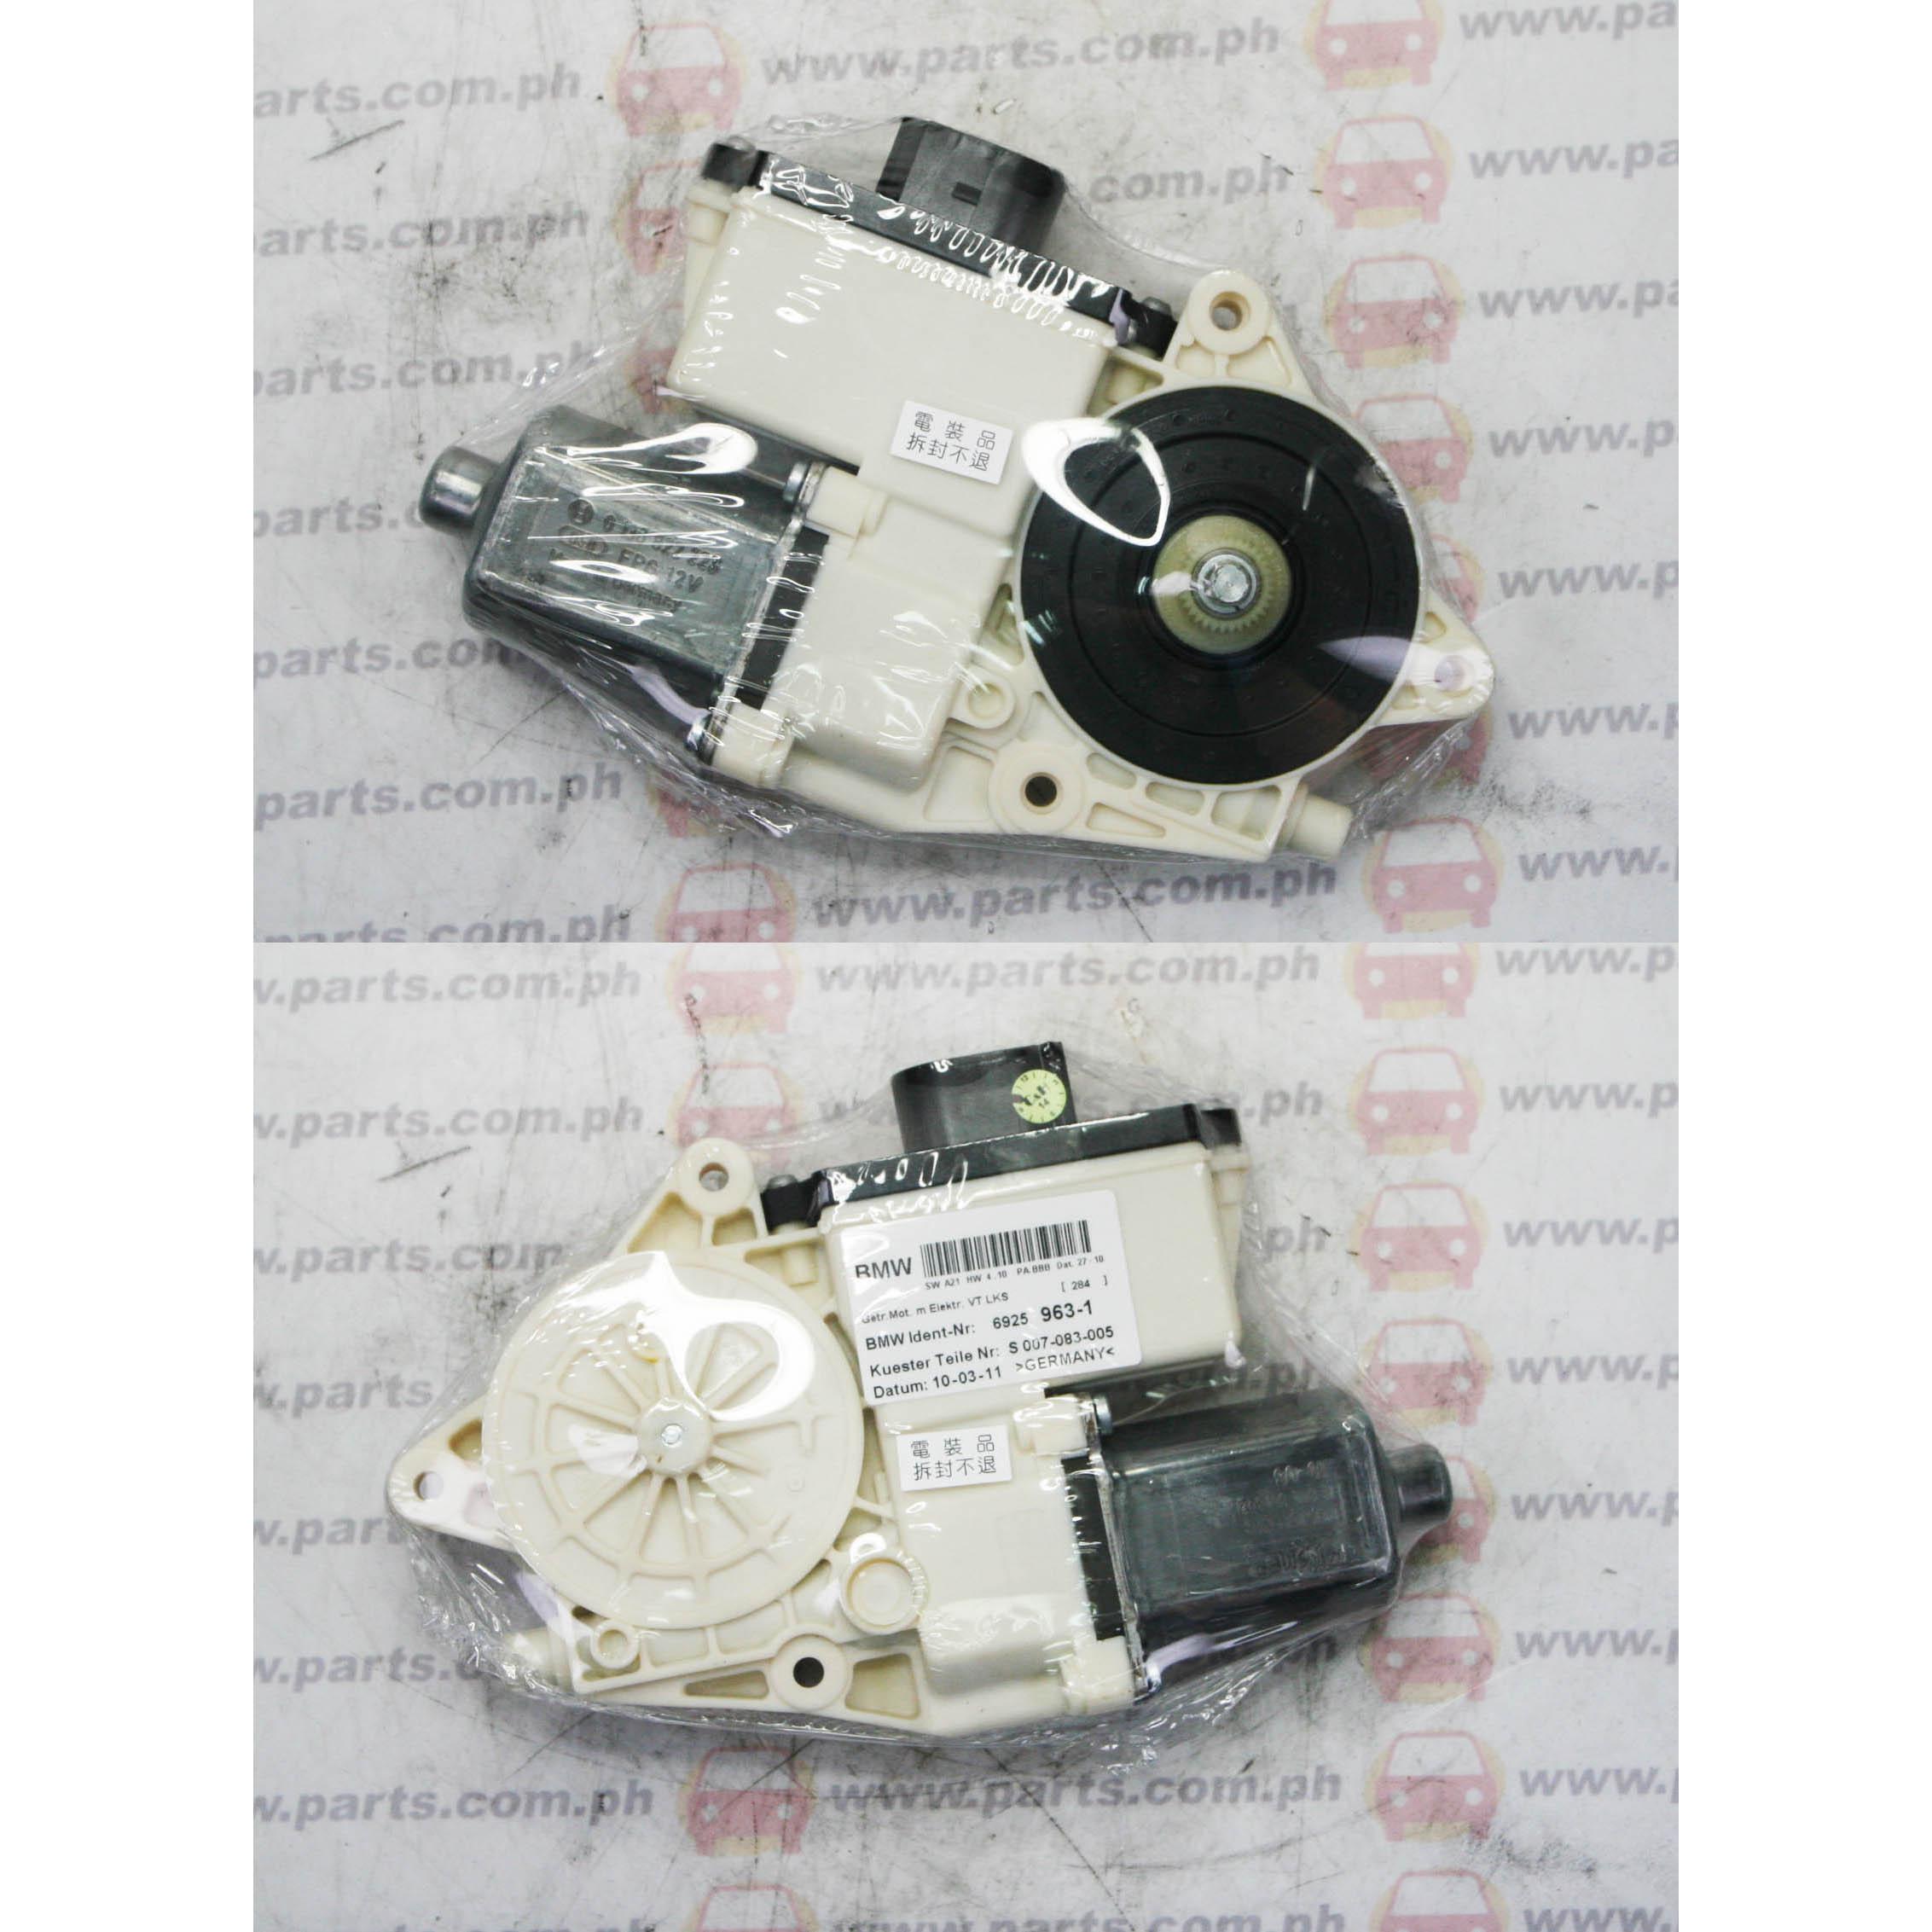 Window lifter motor FL- e83 x3 - TwinCell